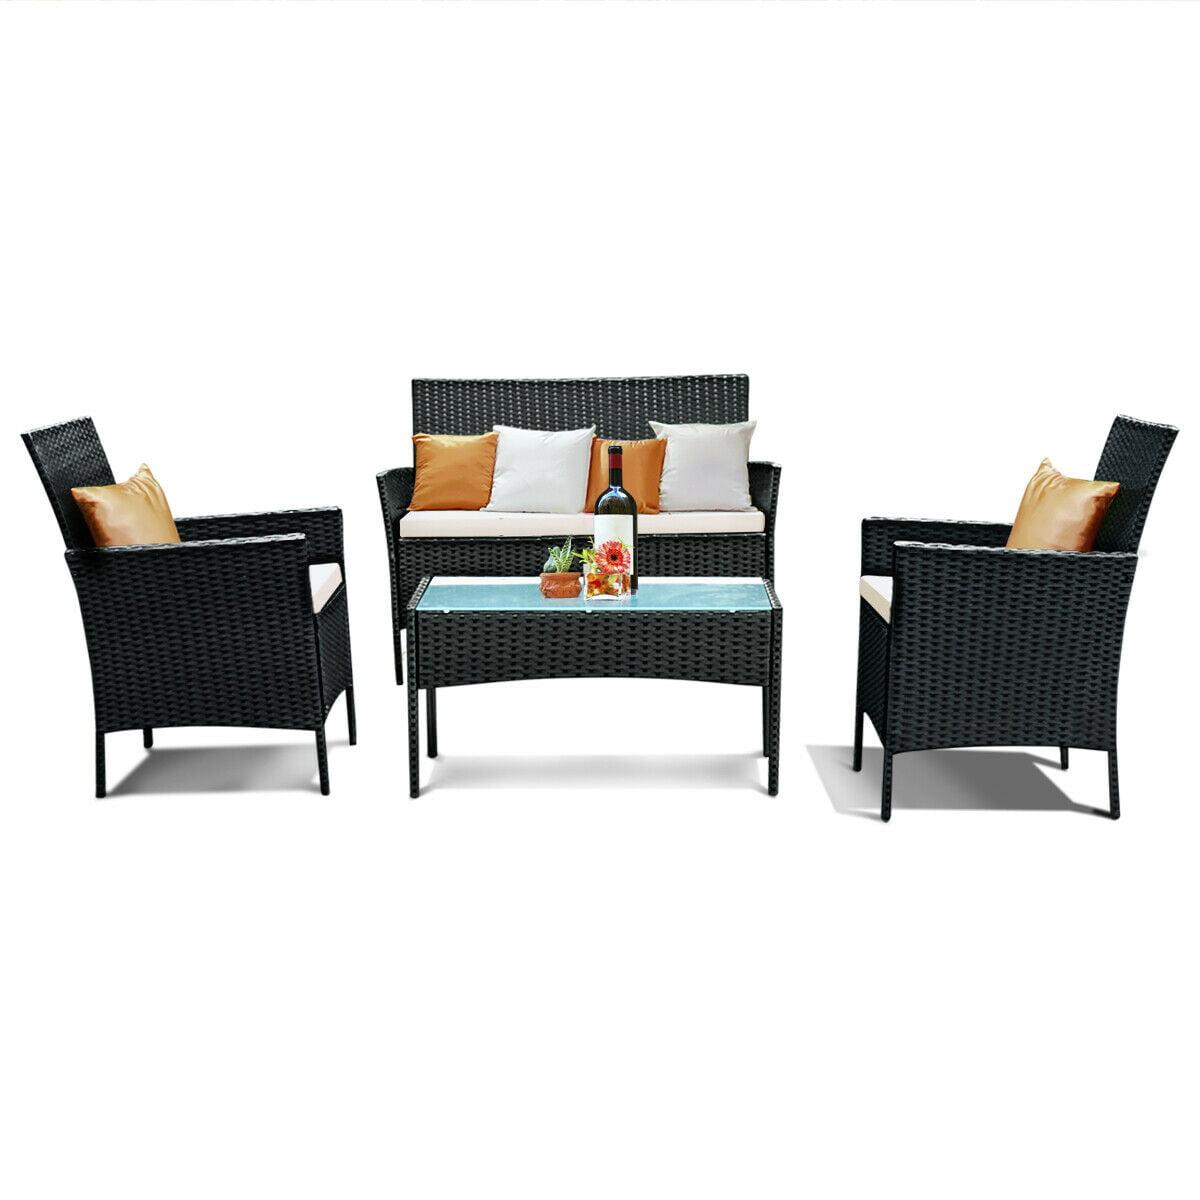 4pcs Patio Rattan Sofa Set Loveseat Cushioned Furniture Outdoor Garden - image 9 of 9